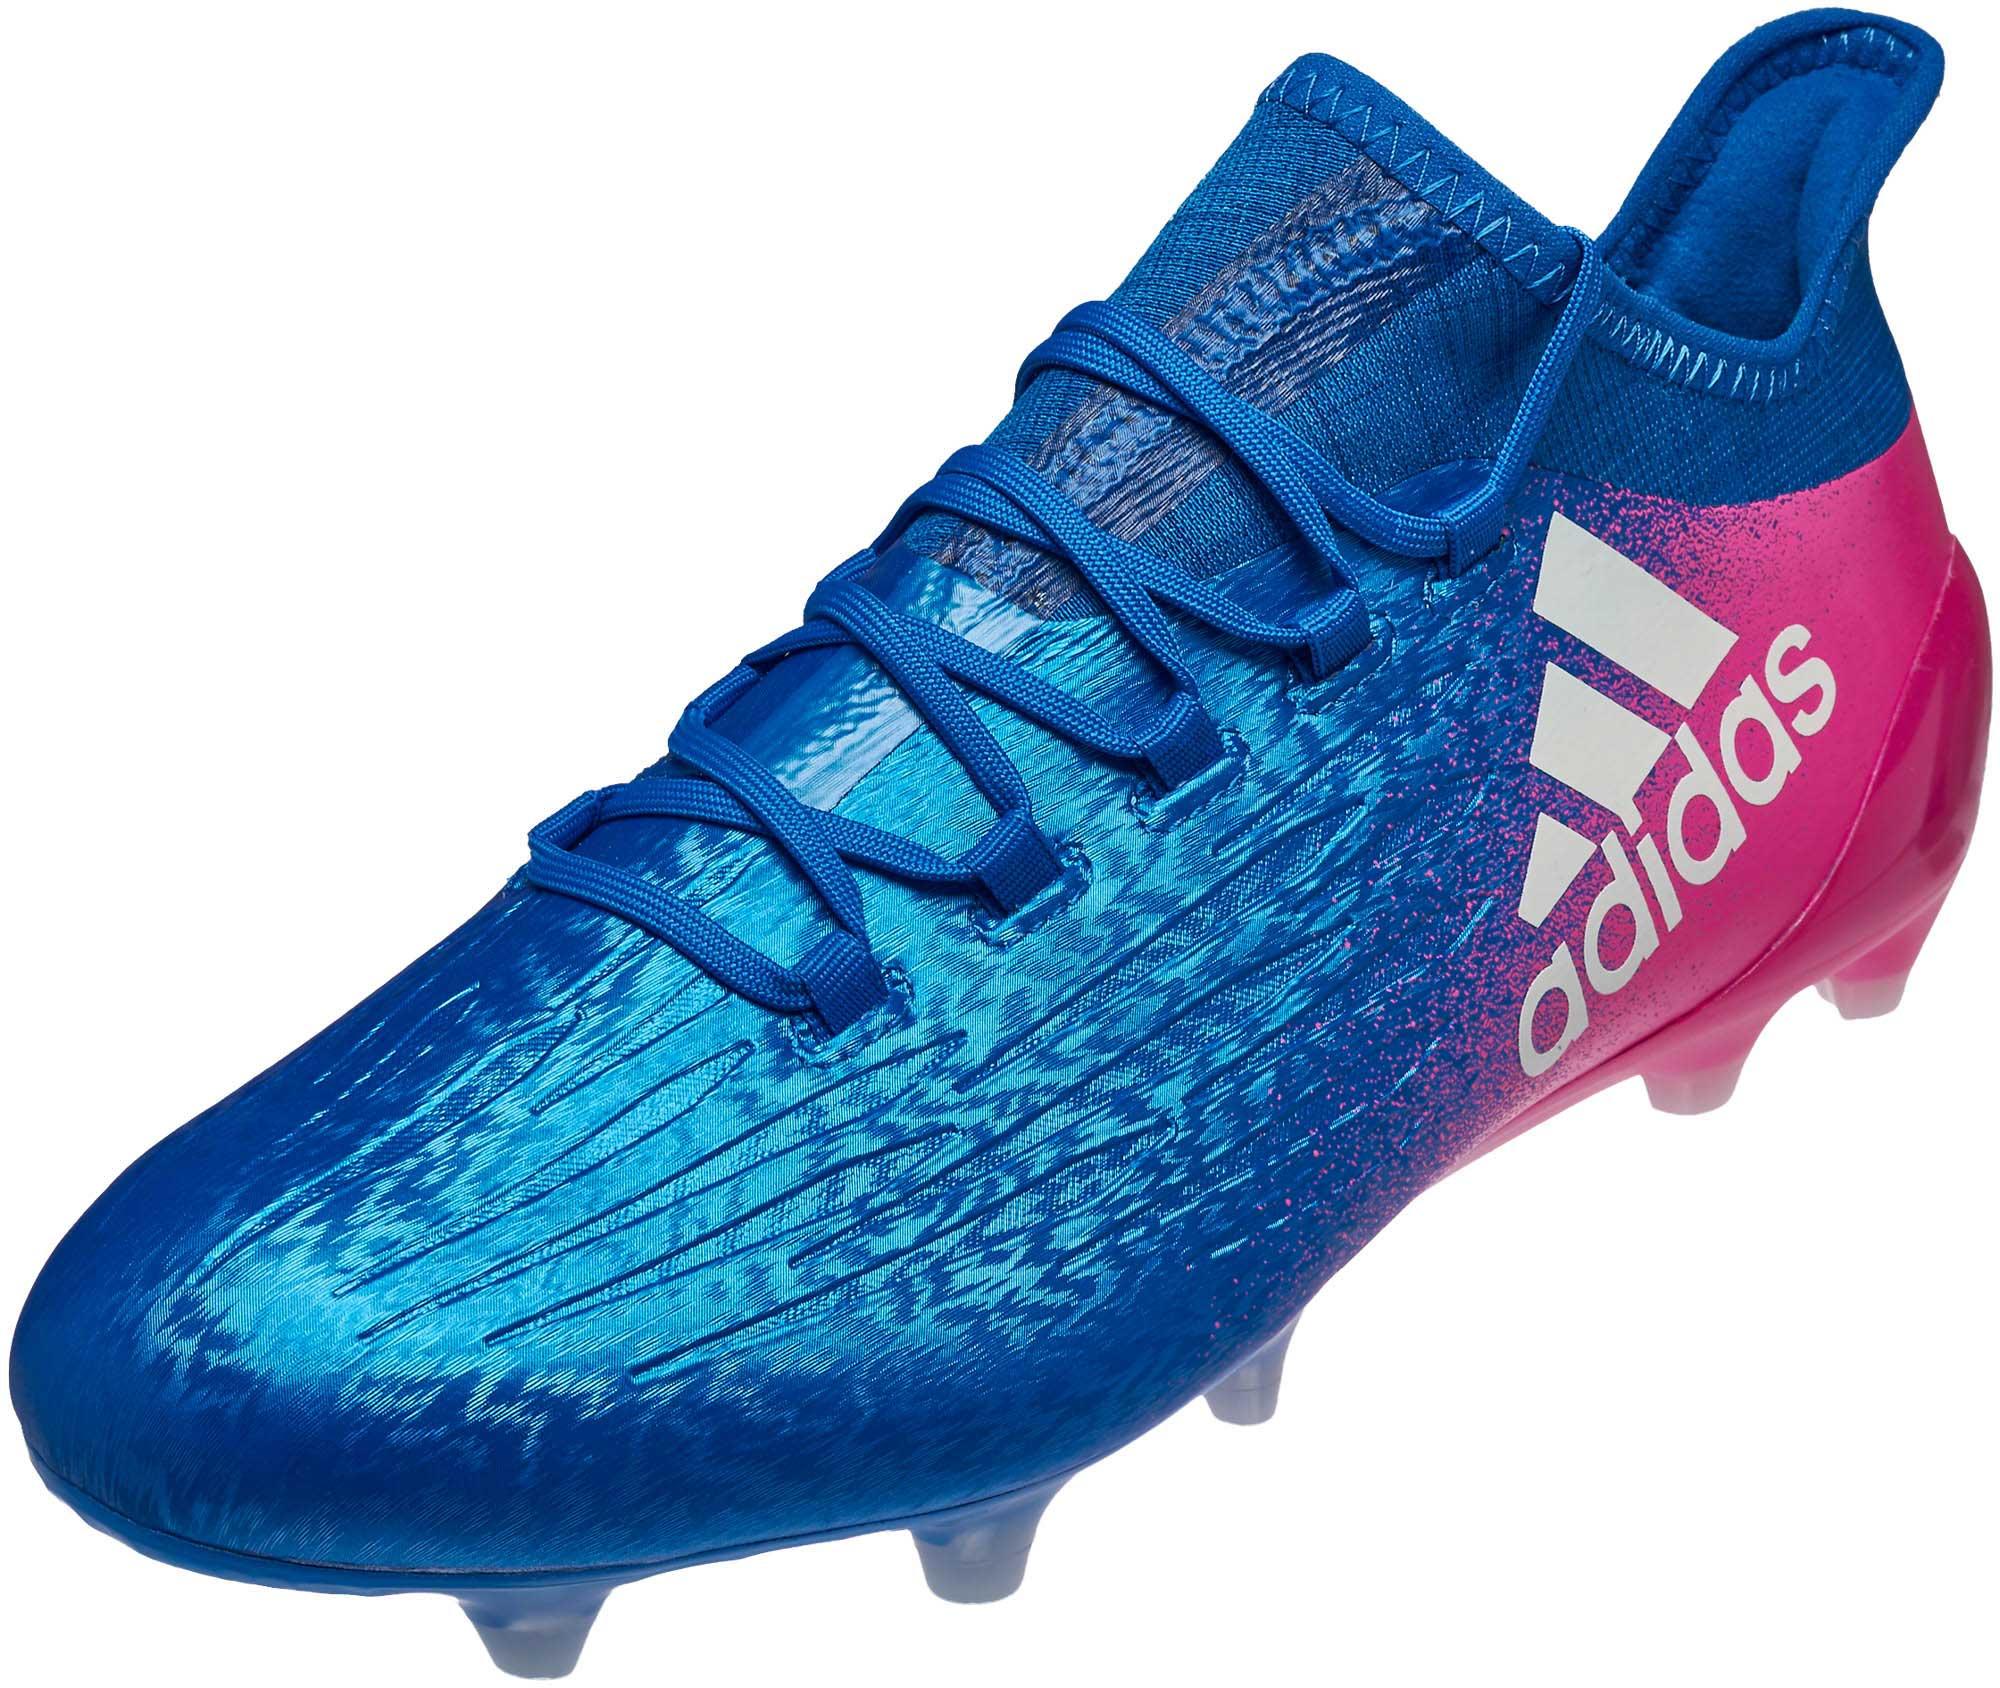 adidas X 16.1 FG Cleats - adidas X Soccer Cleats f41332231